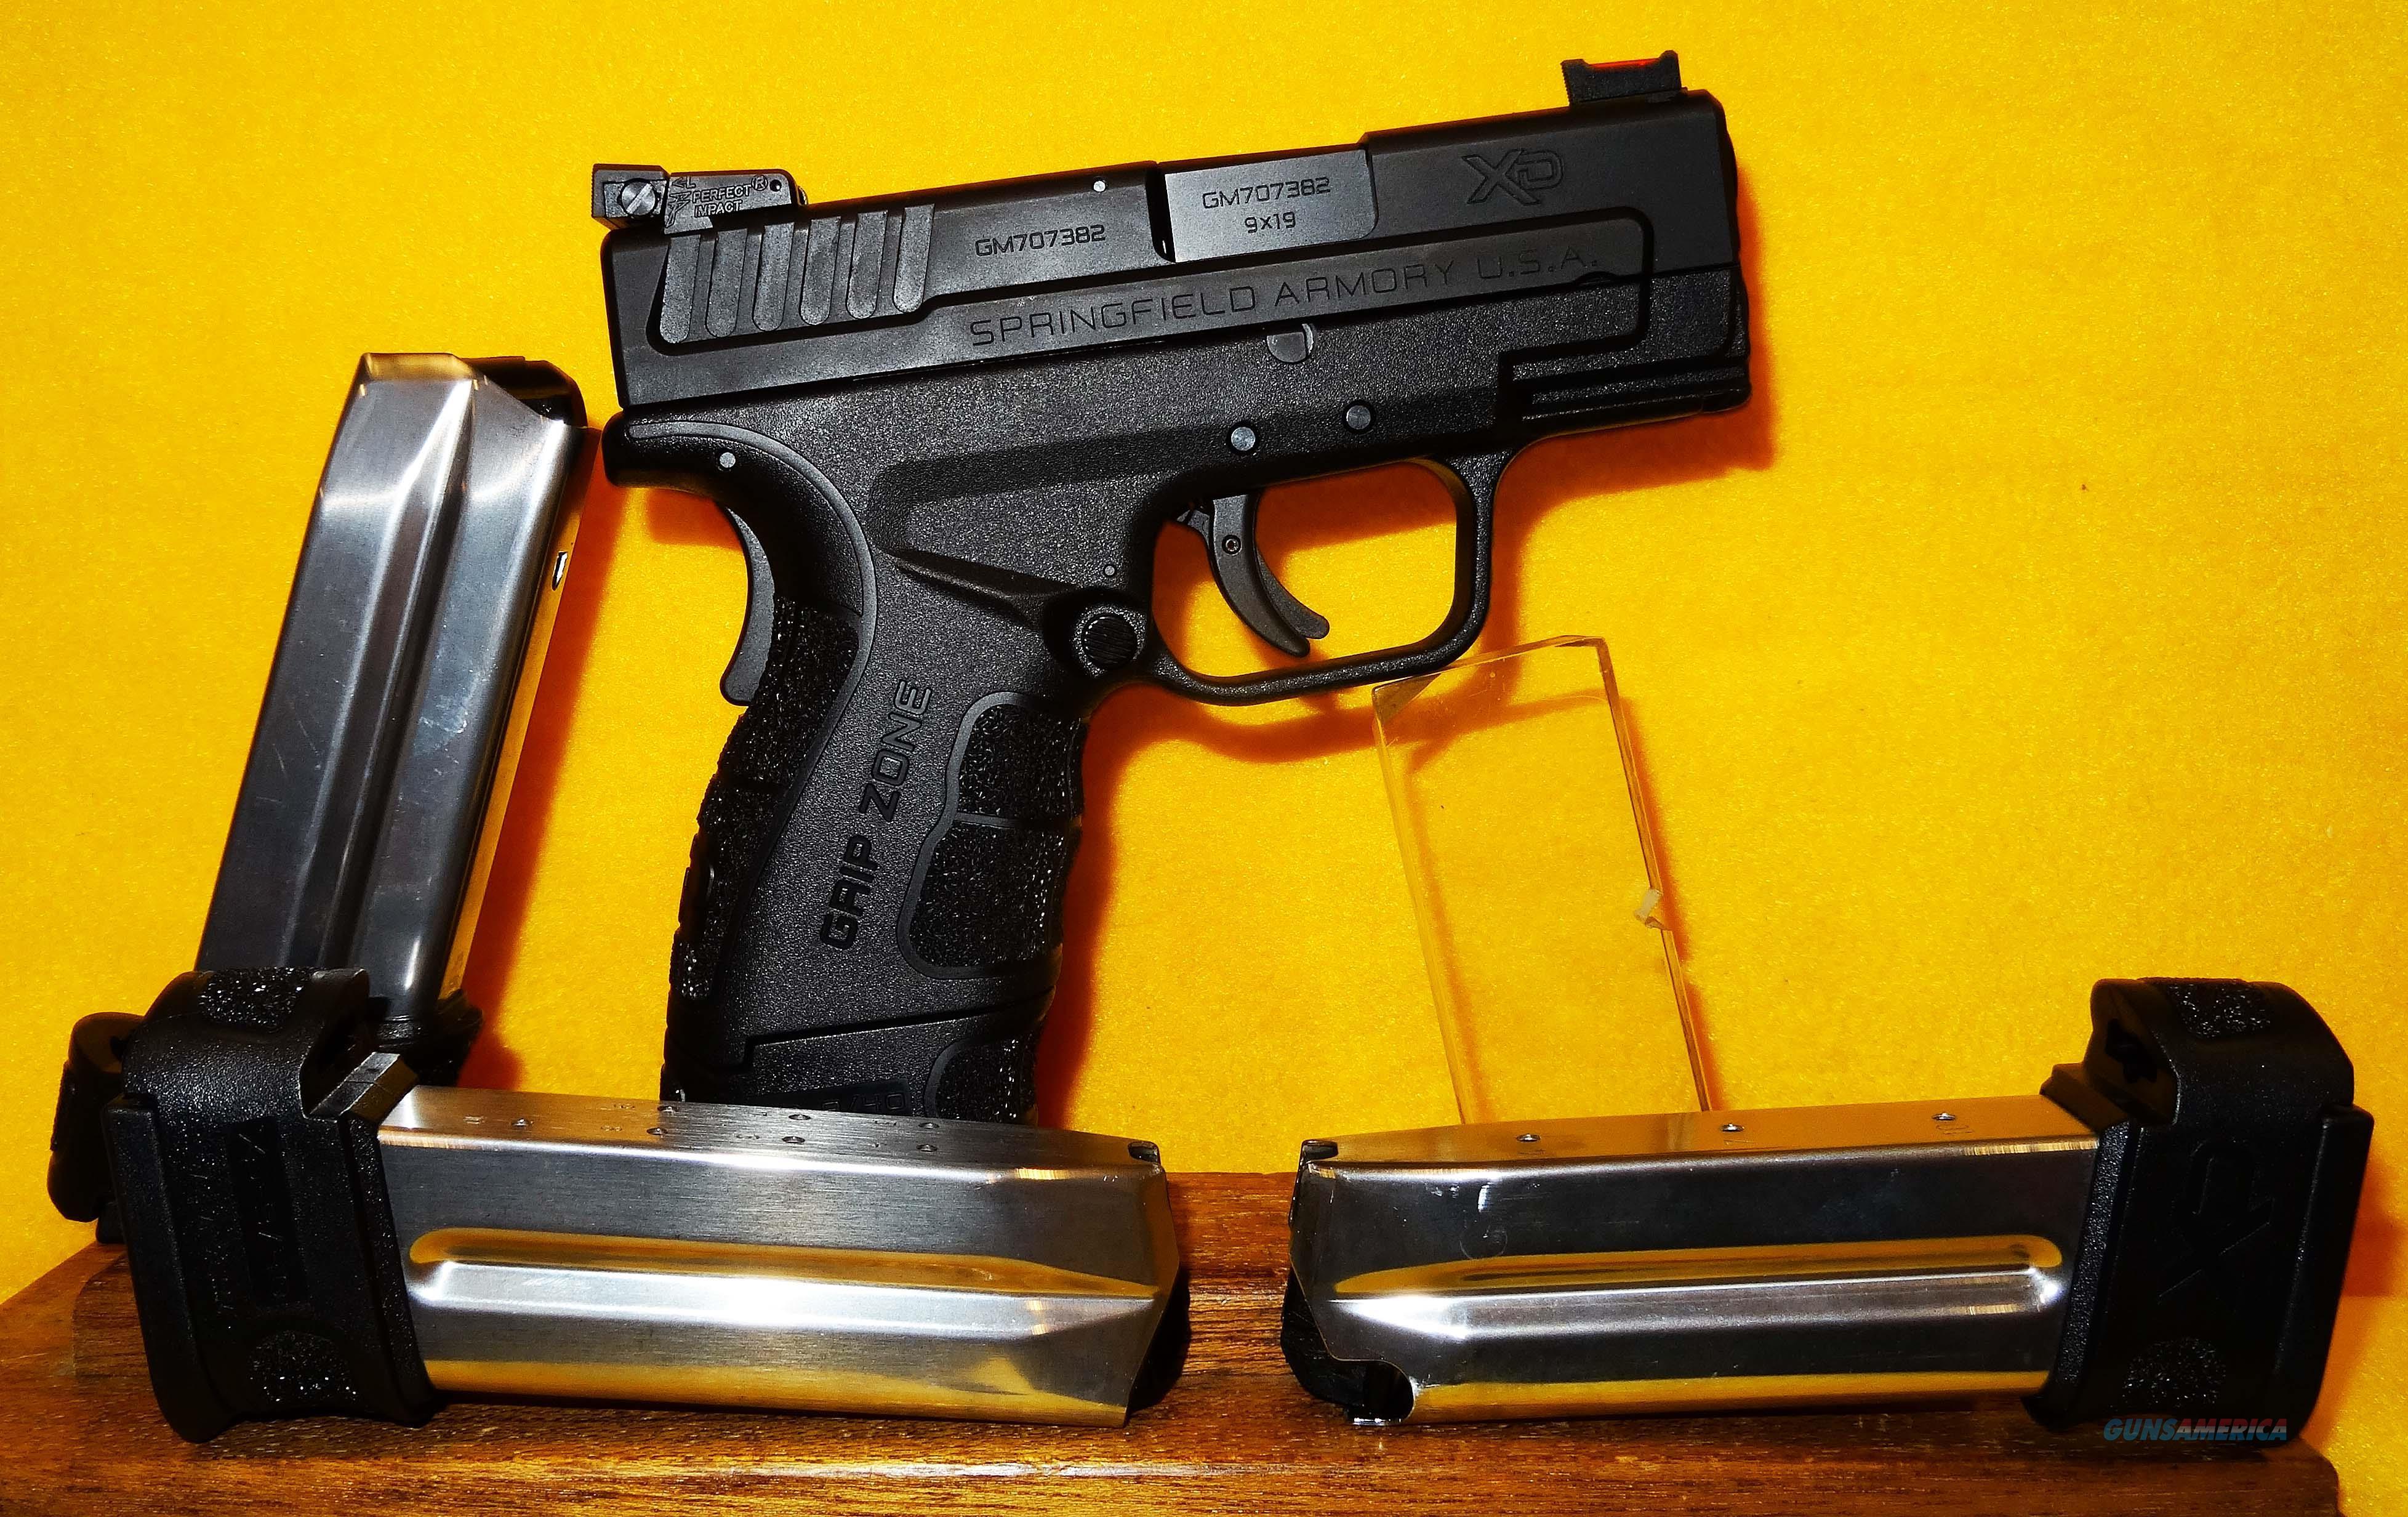 SPRINGFIELD ARMORY XD MOD.2  Guns > Pistols > Springfield Armory Pistols > XD-Mod.2